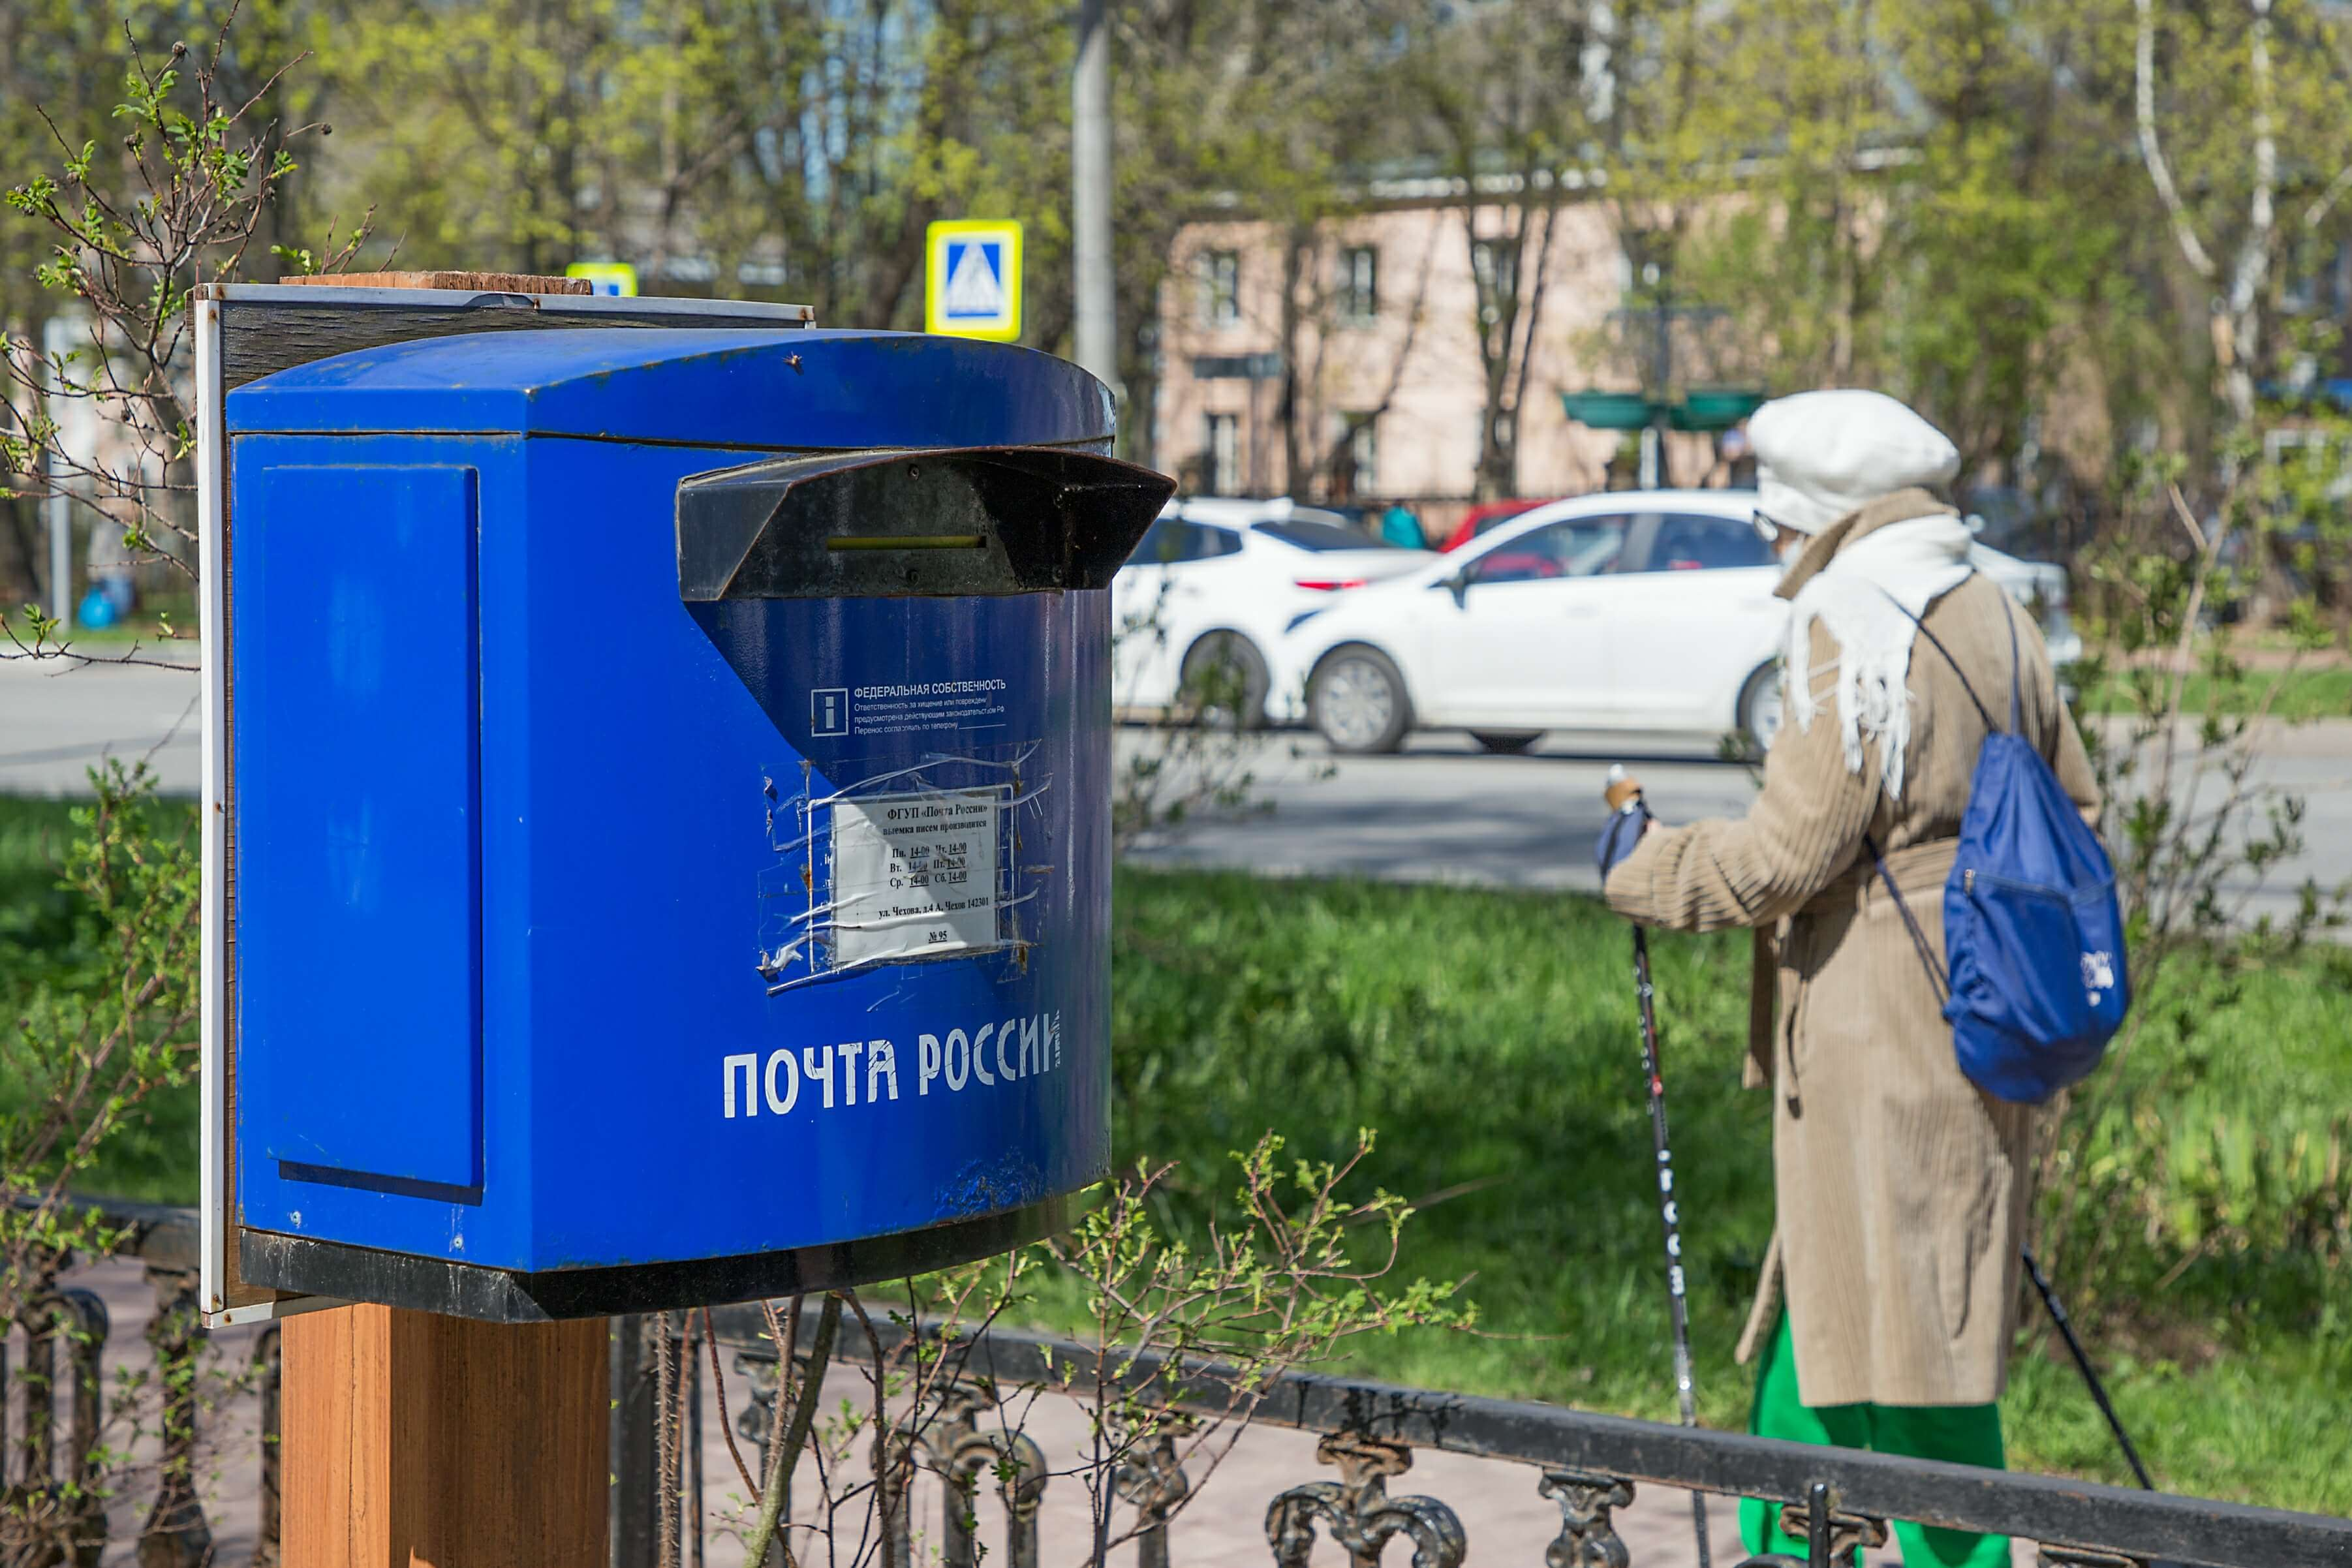 Ilya Galakhov/Global Look Press